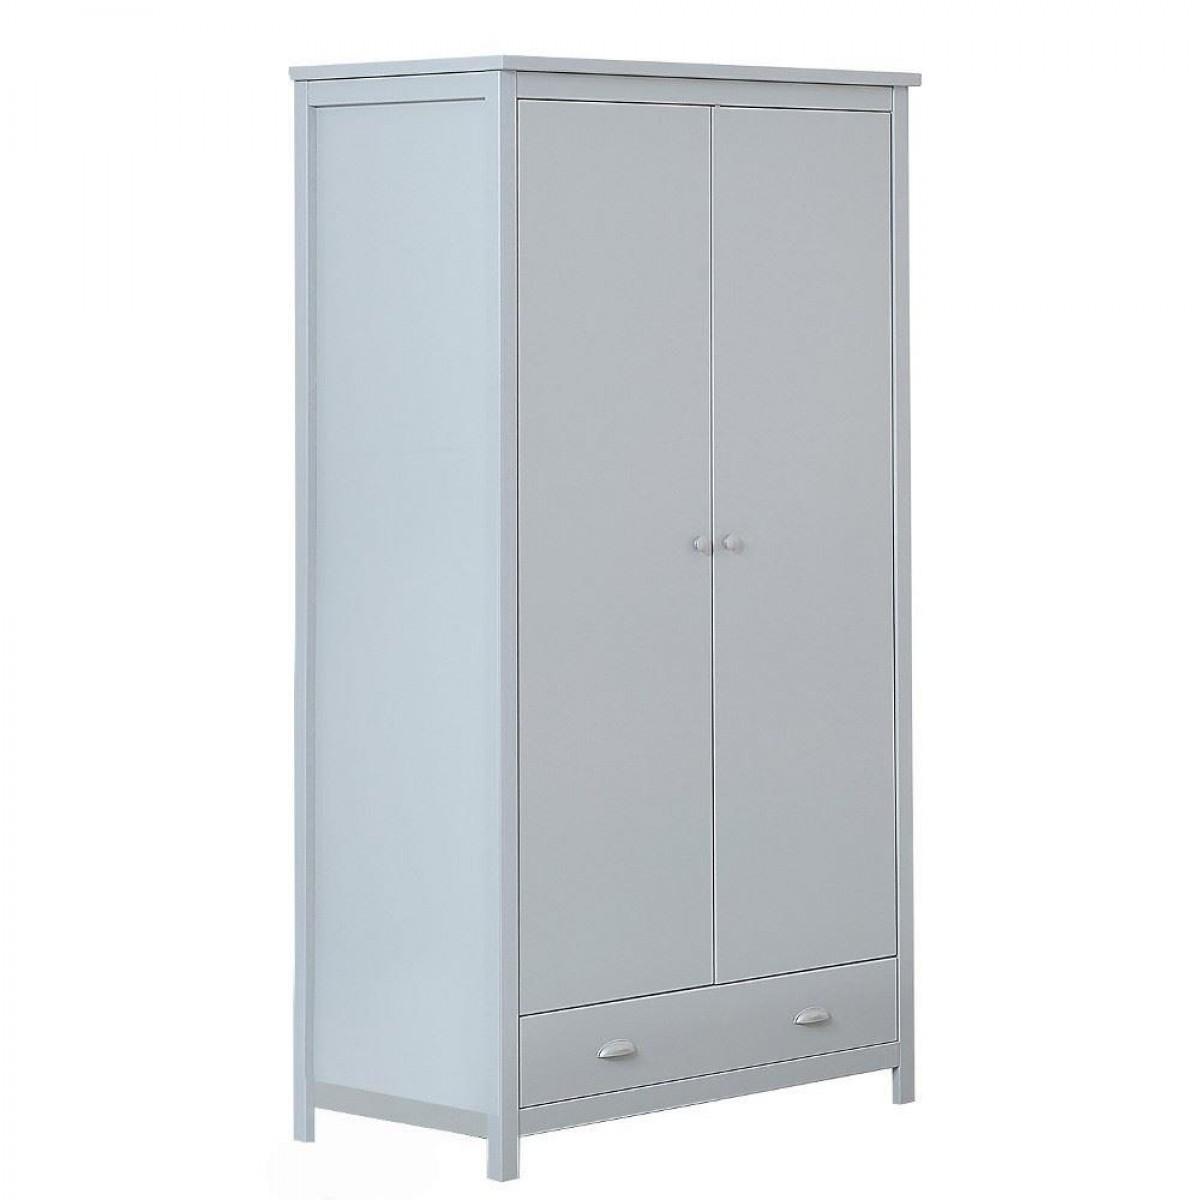 Kingston Grey Wooden 2 Door Combination Wardrobe